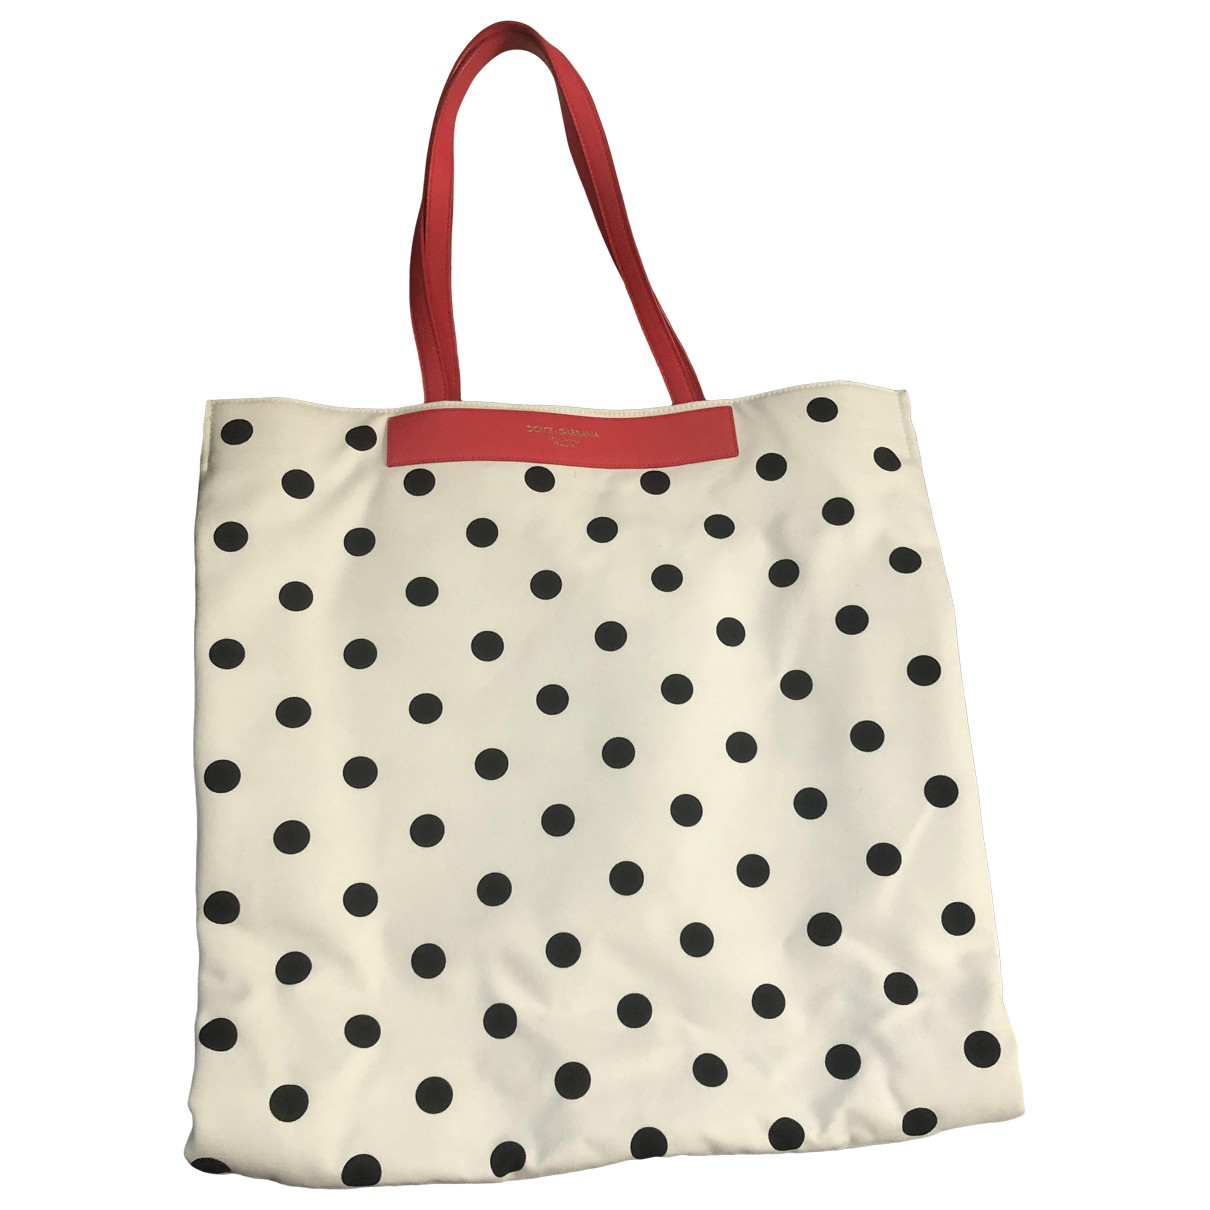 Dolce & Gabbana \N White Cotton handbag for Women \N